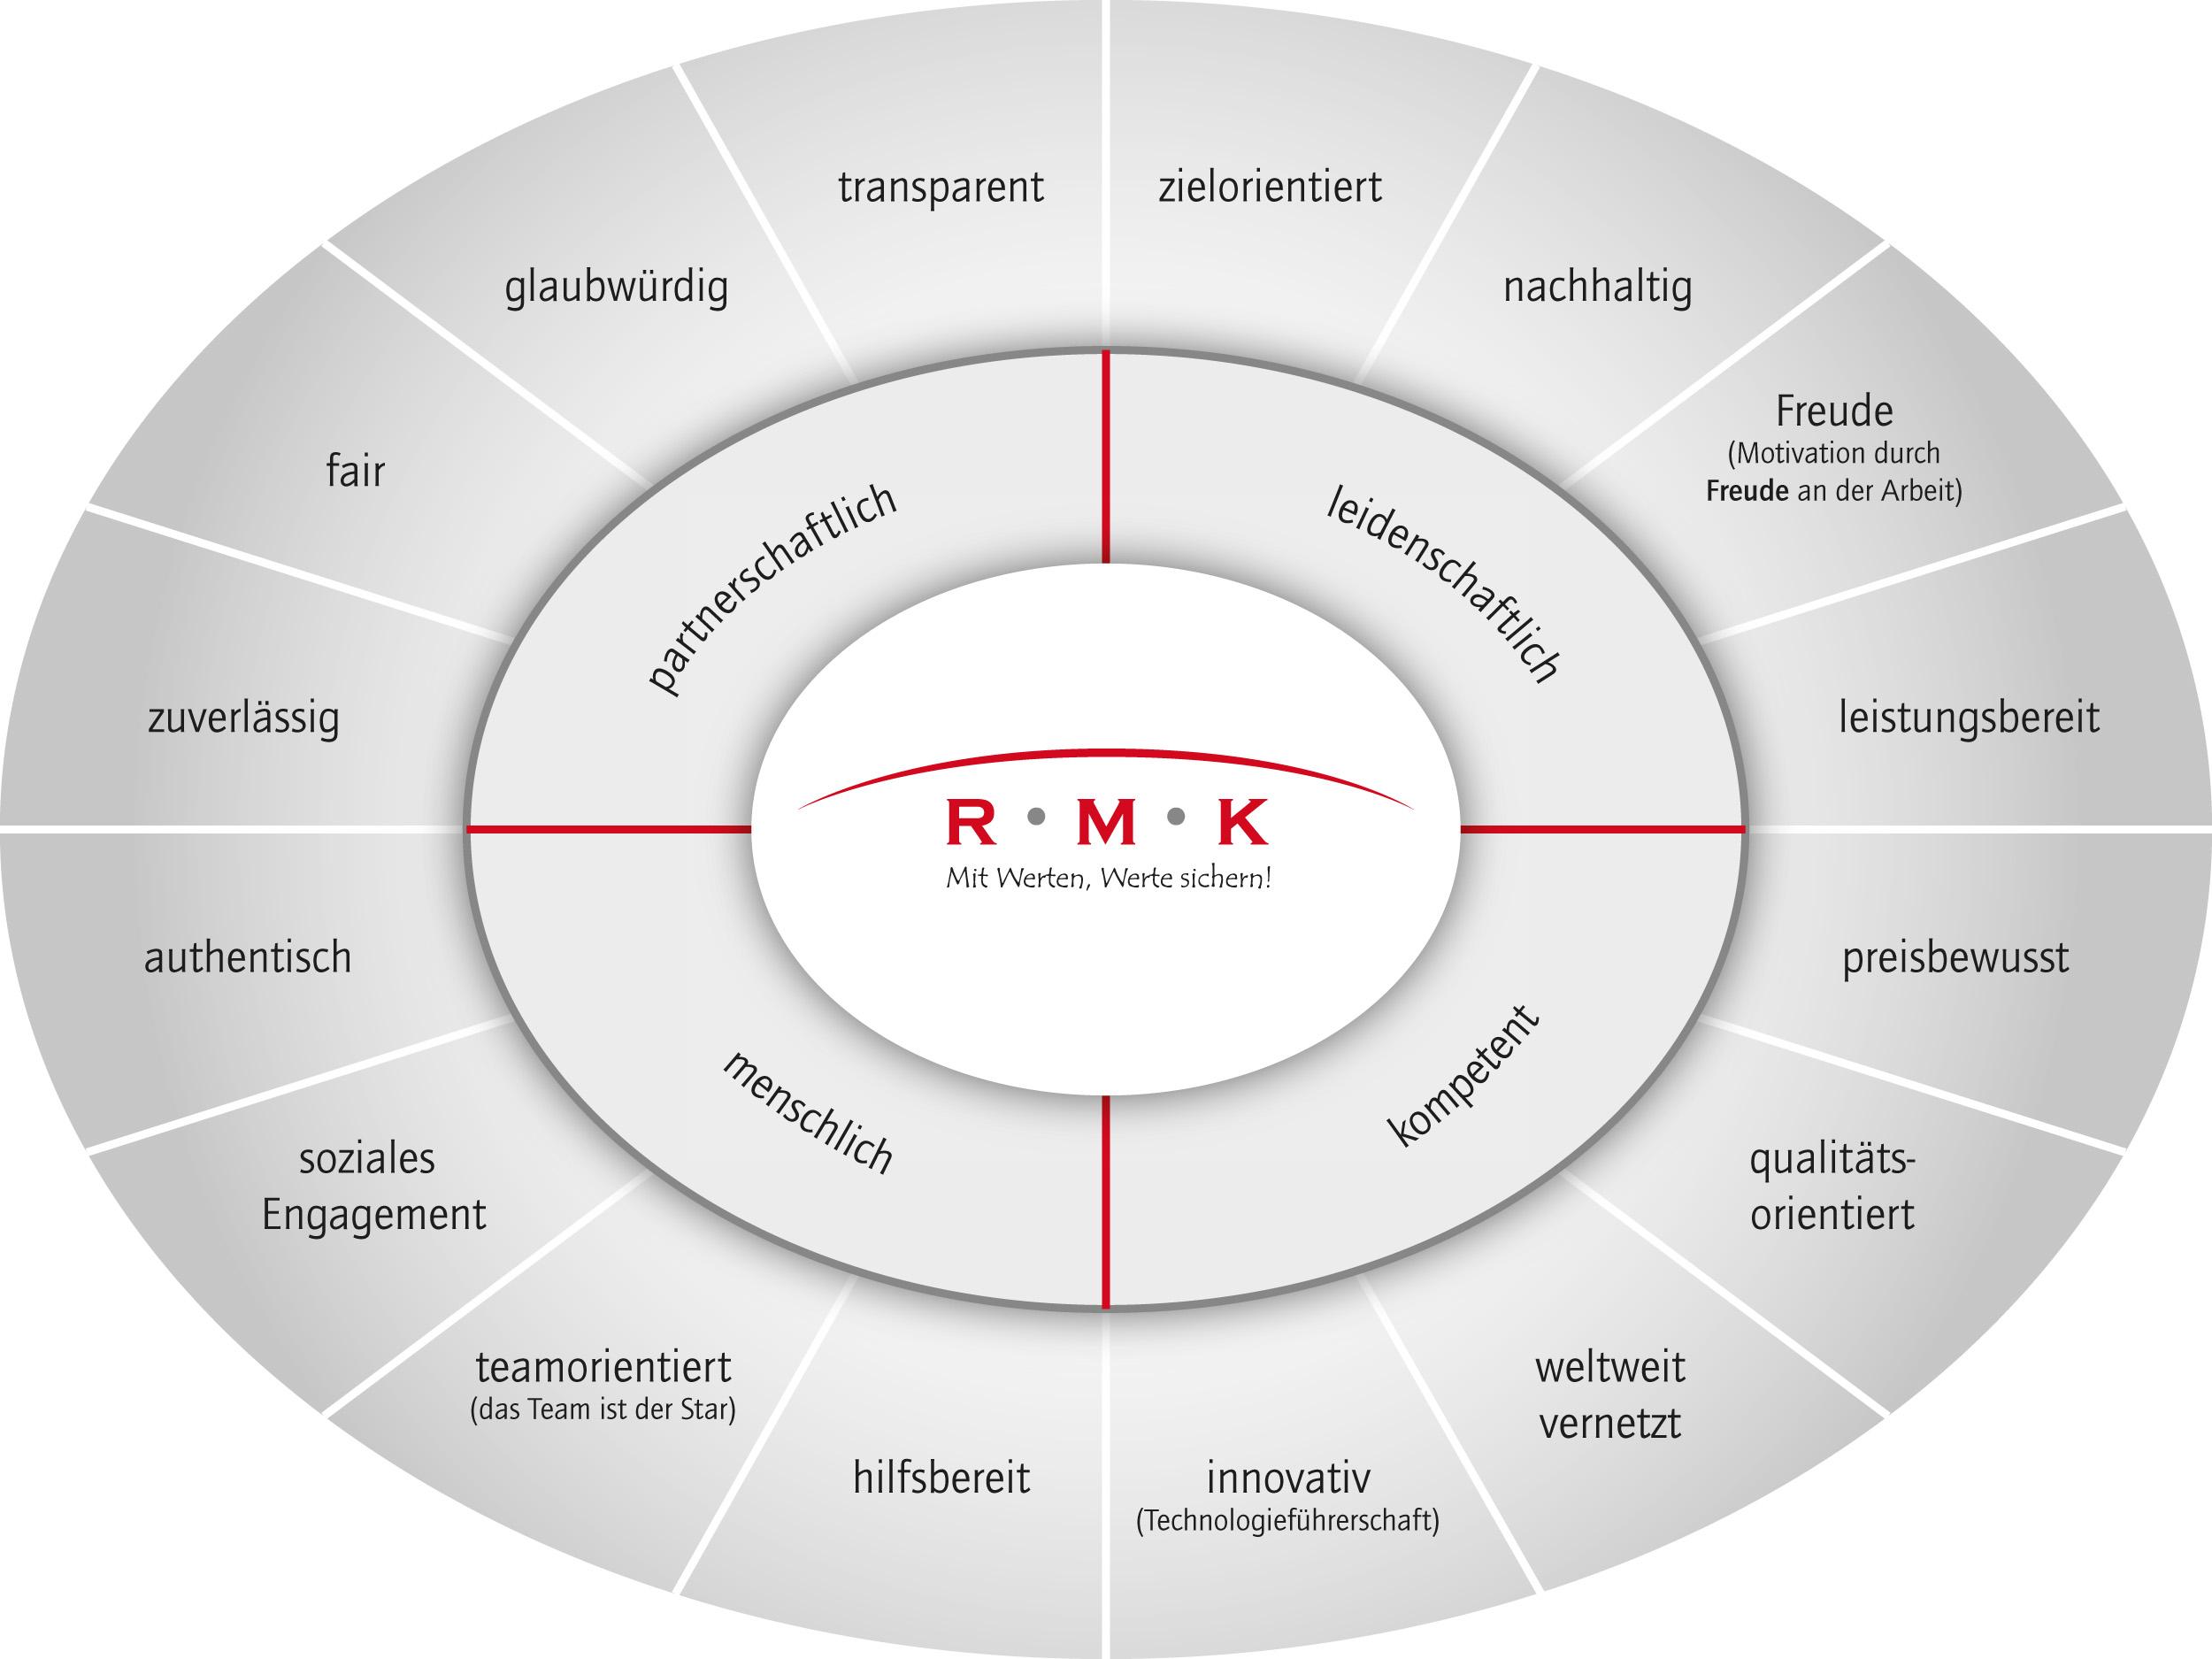 RMK Markenidentität